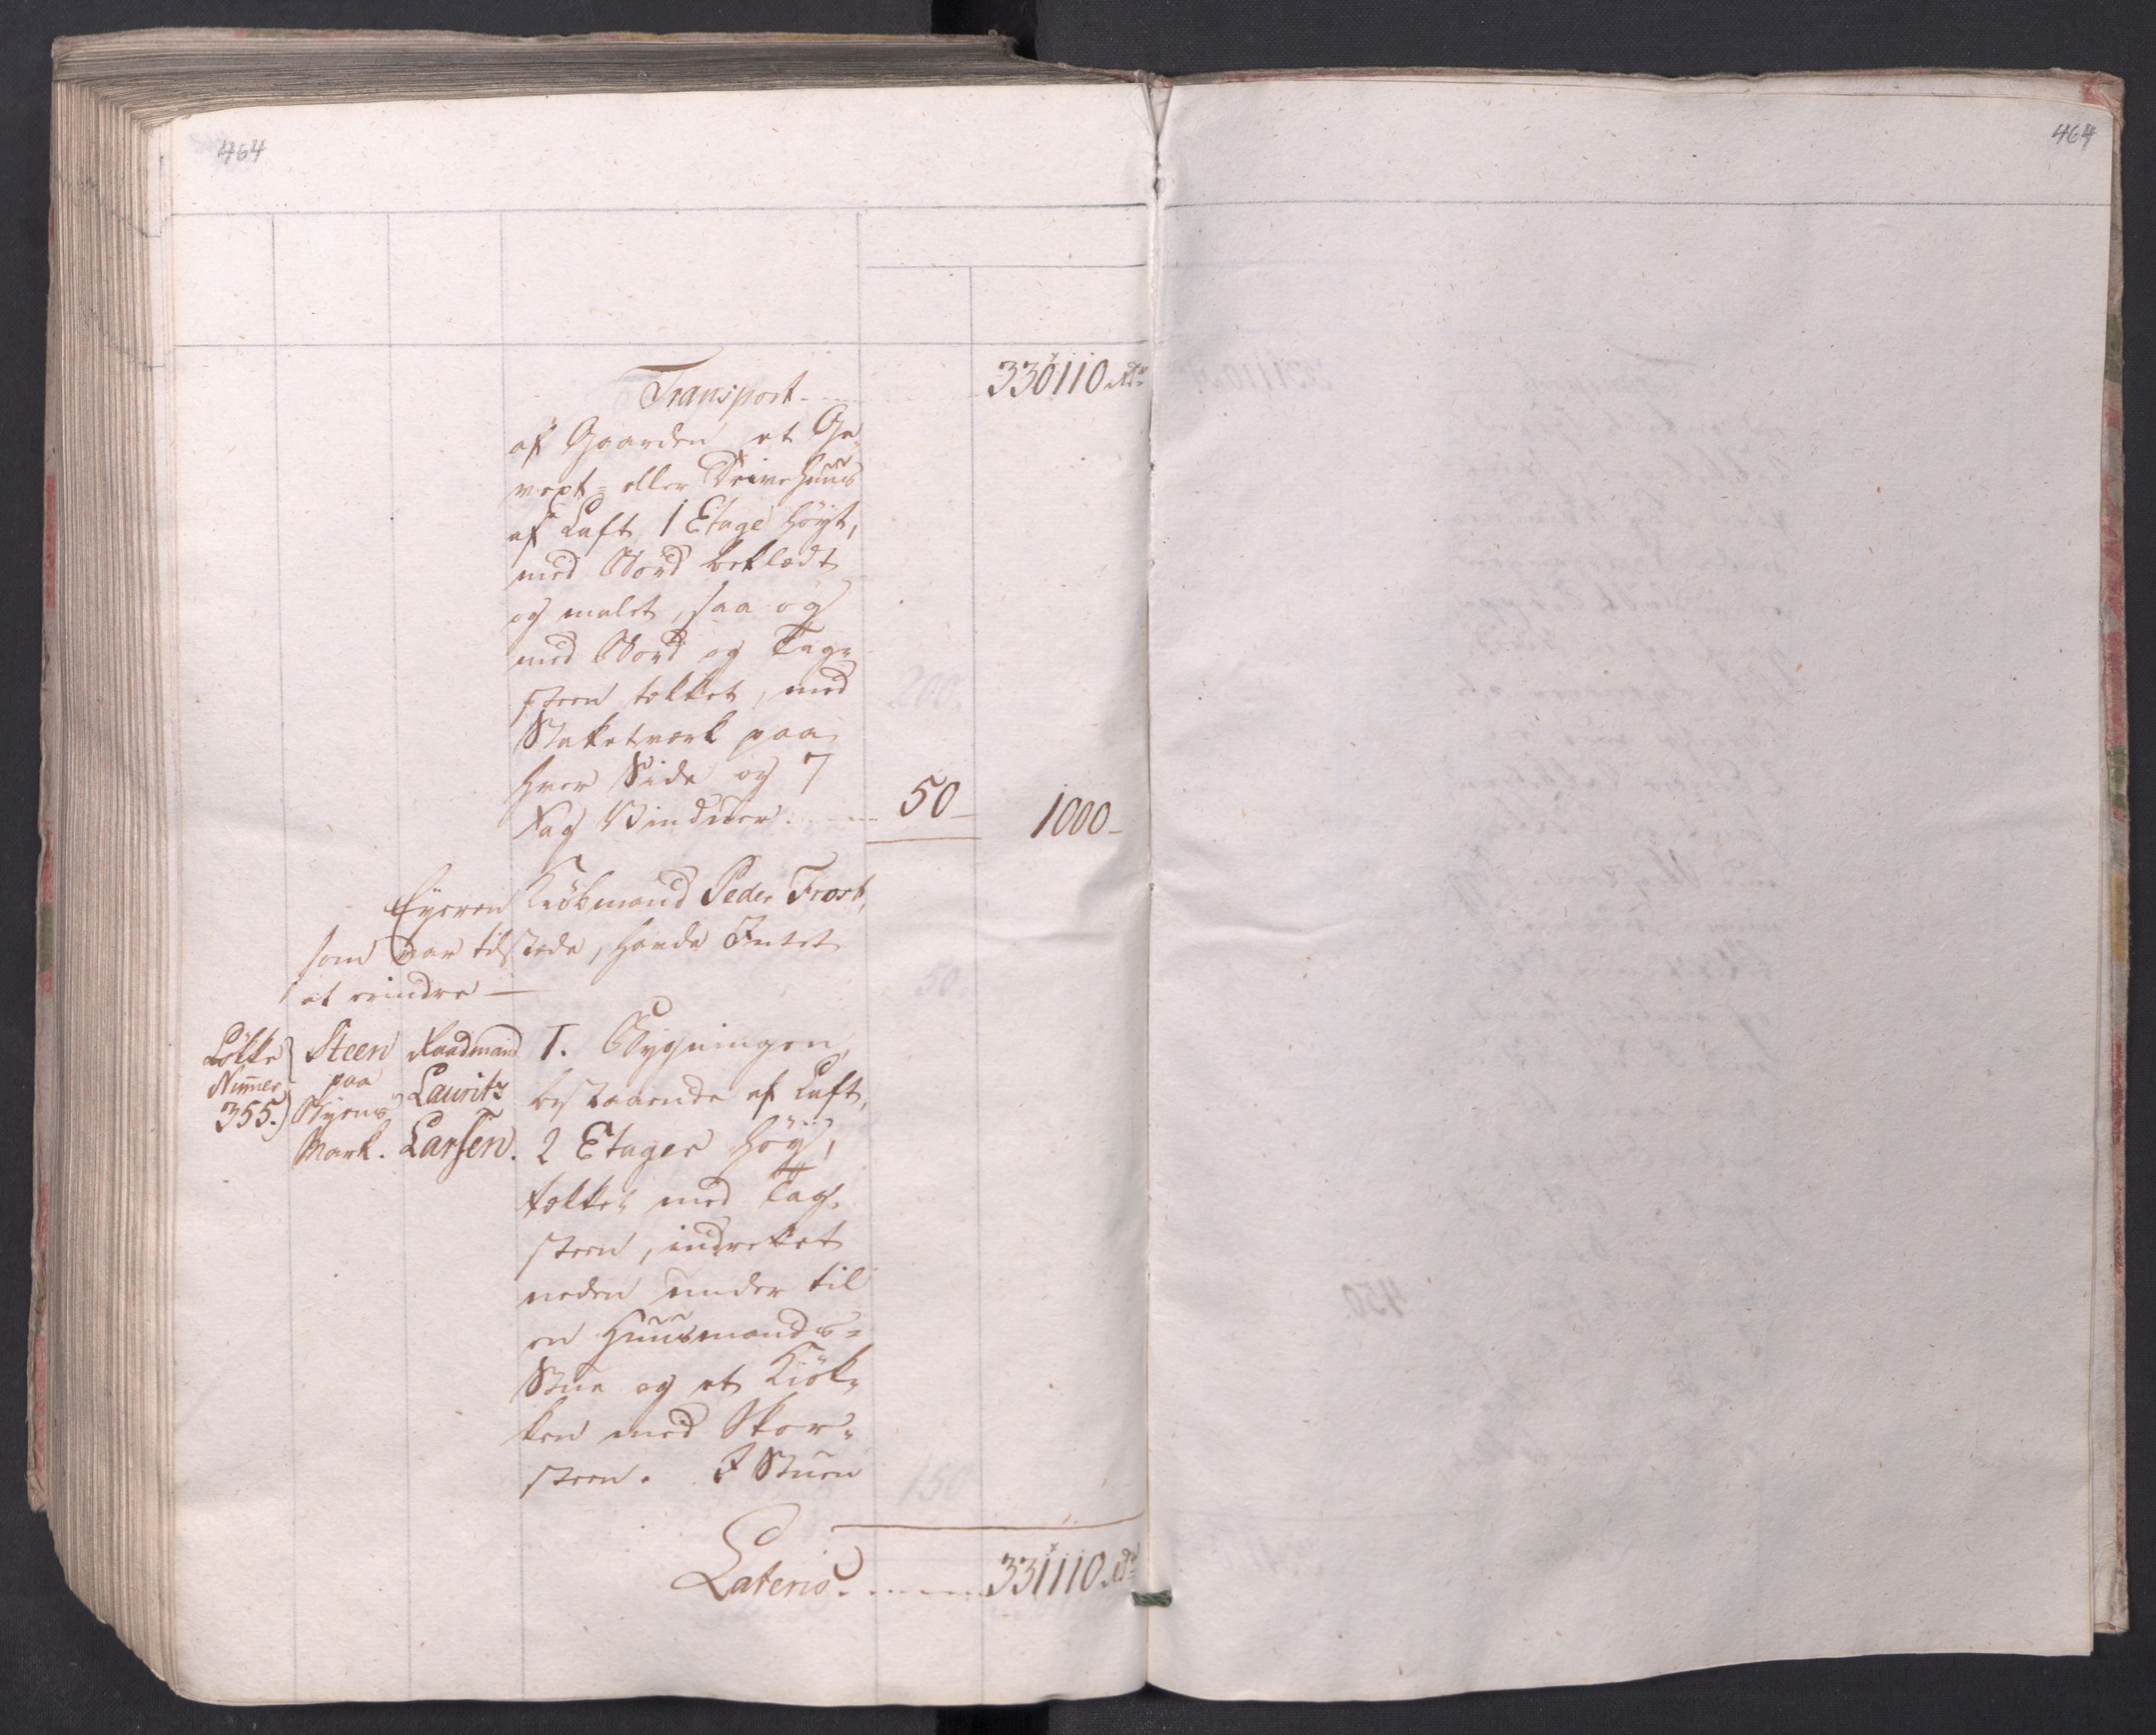 SAO, Kristiania stiftamt, I/Ia/L0015: Branntakster, 1797, s. 464